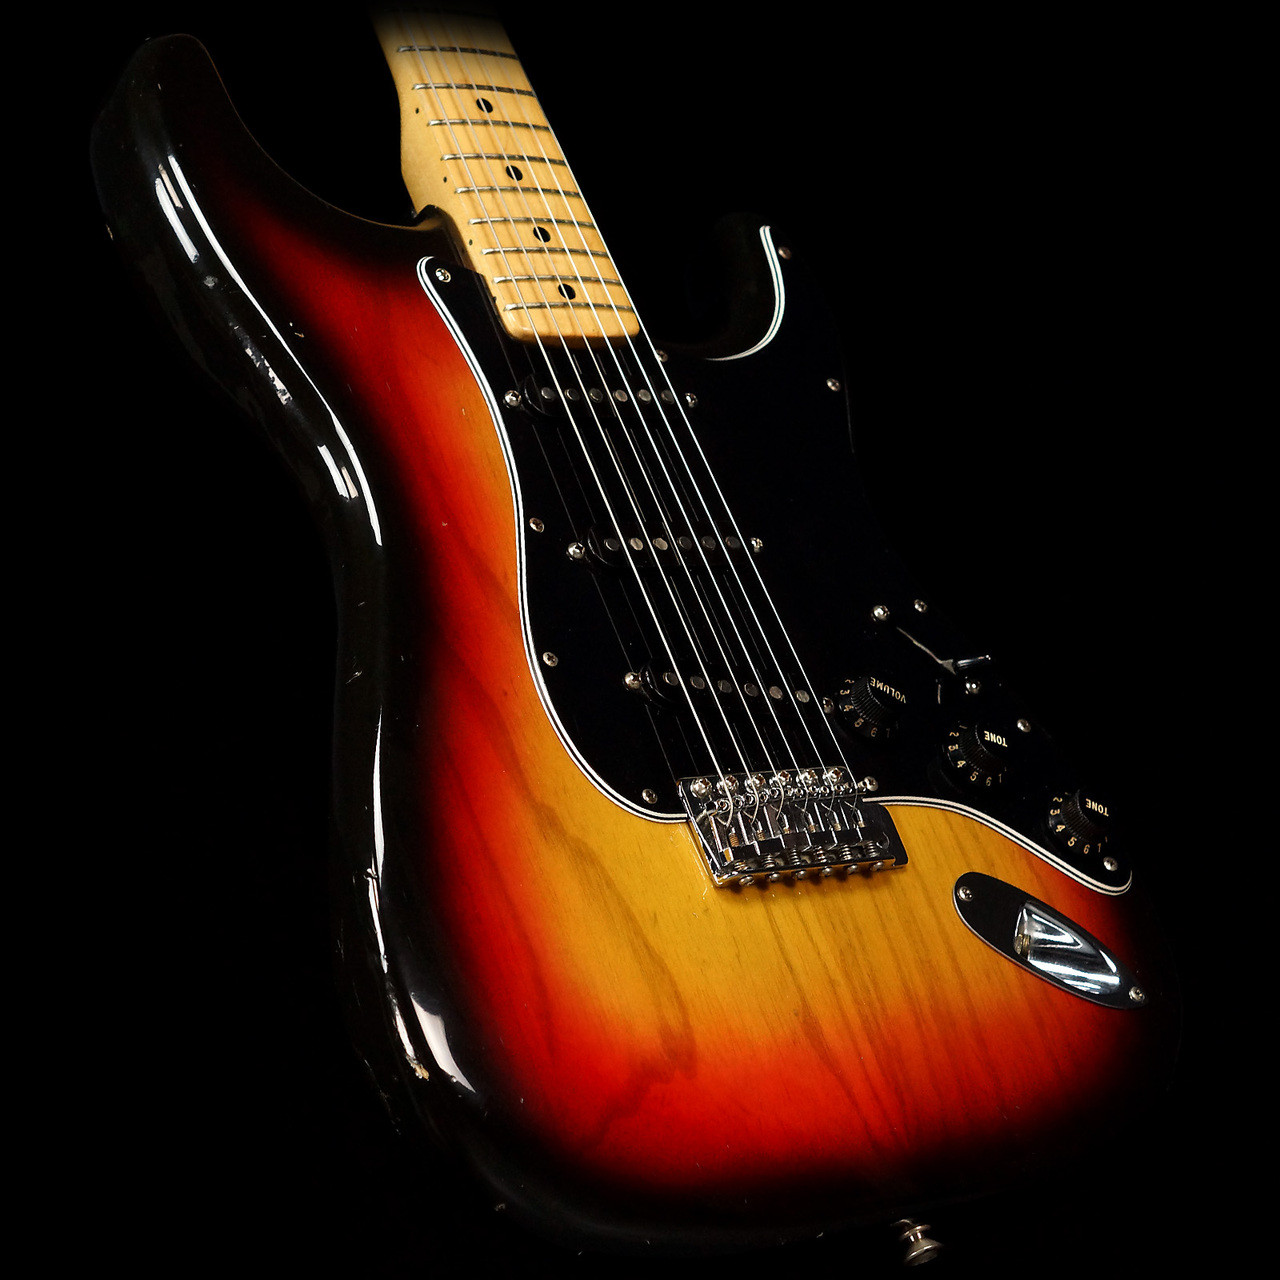 12378 2: 1977 Vintage Fender Stratocaster Sunburst